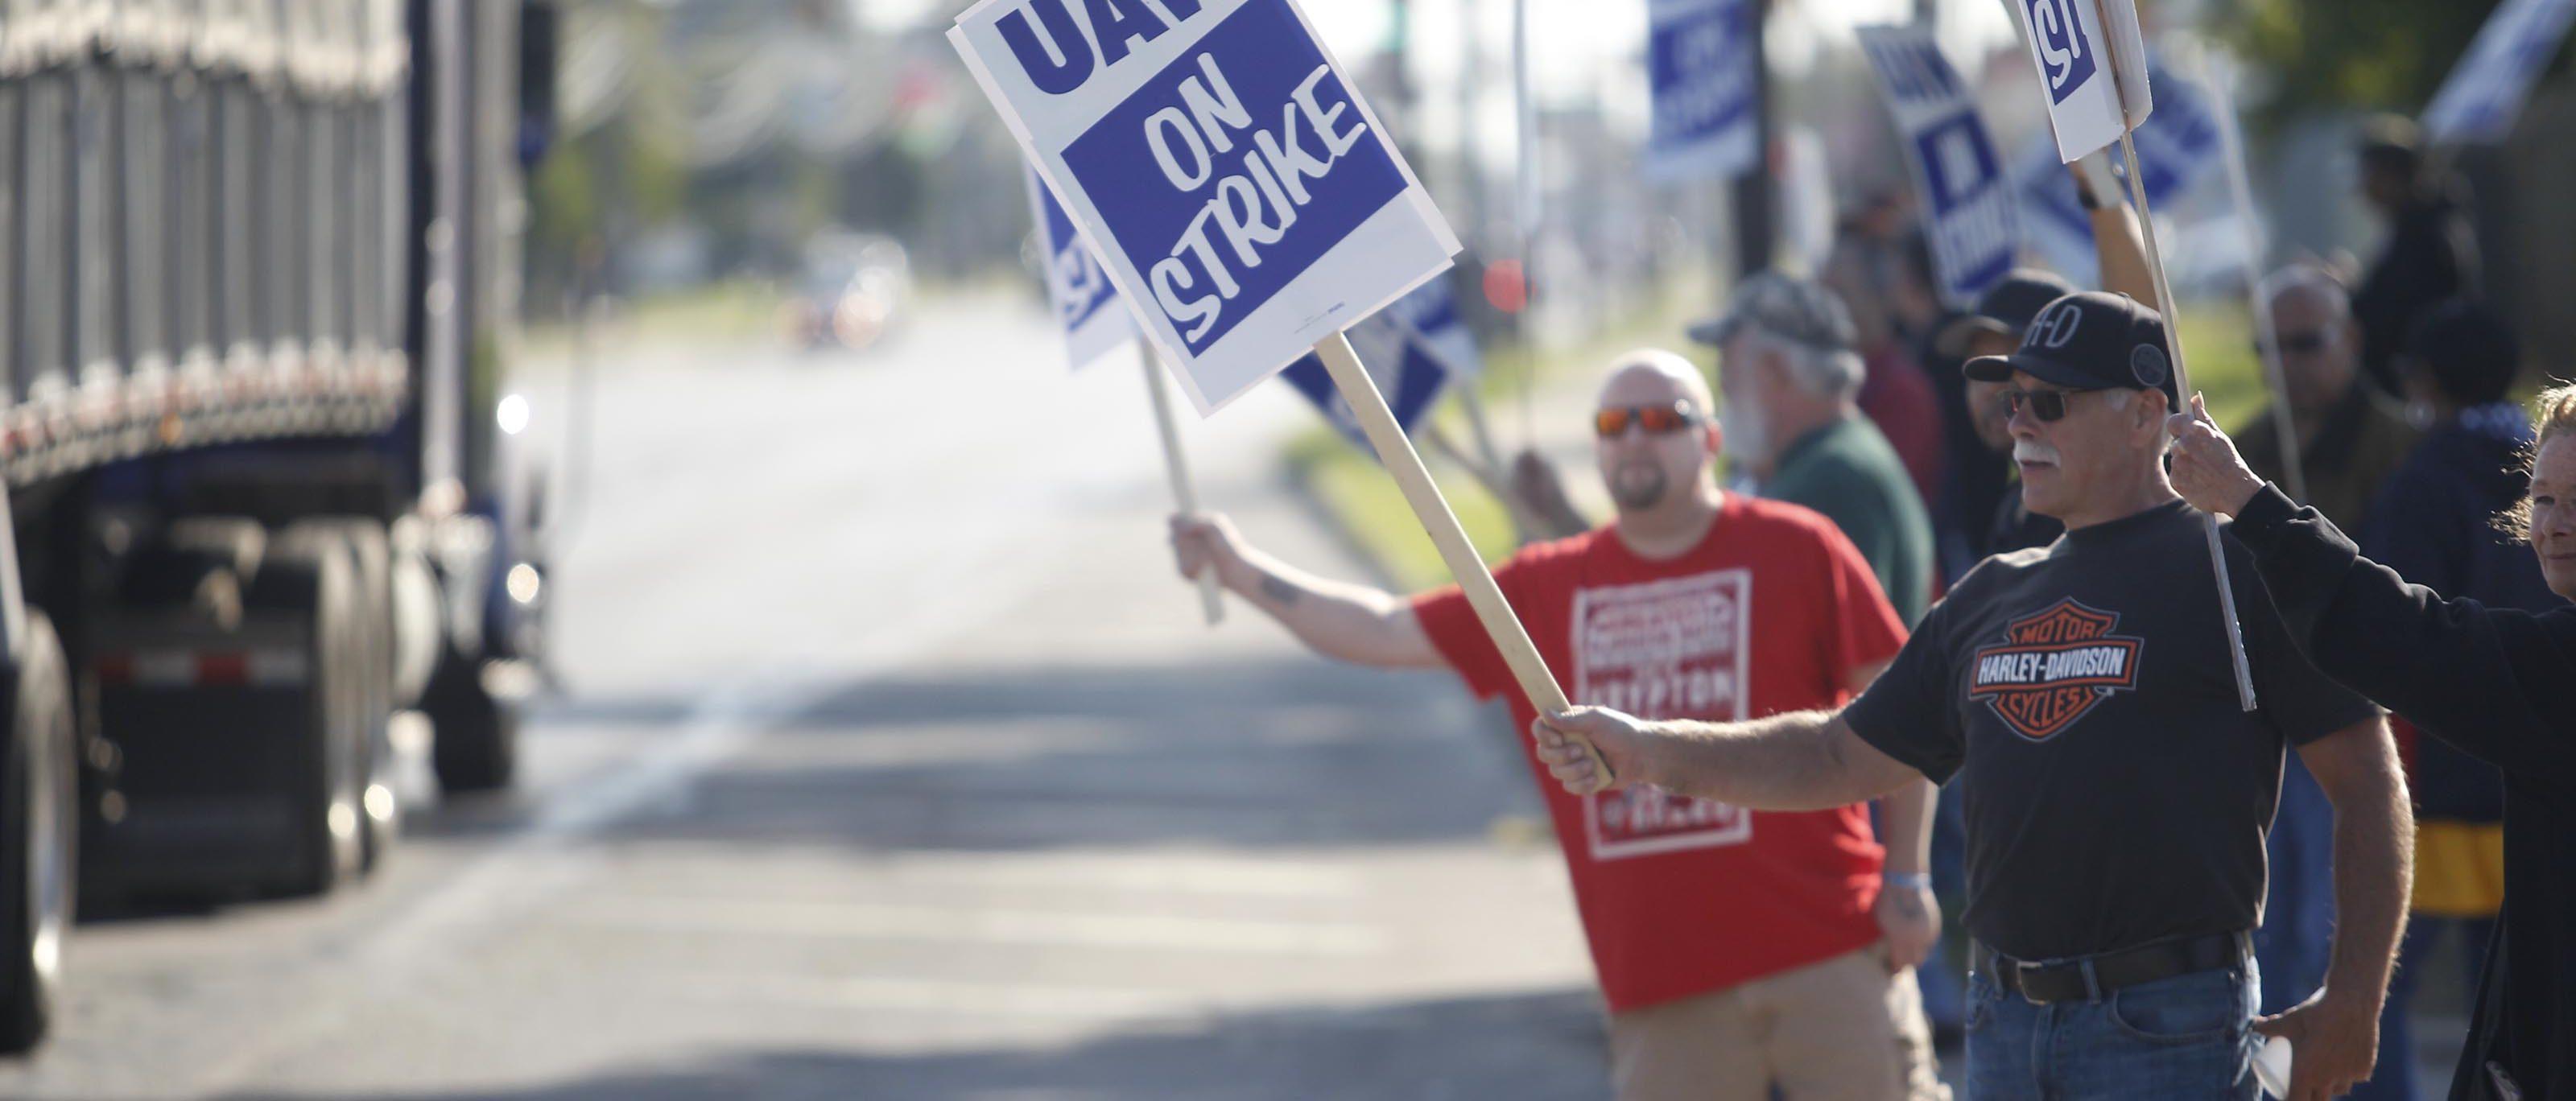 Auto Union Members' Strike Against General Motors Rolls Into Second Week